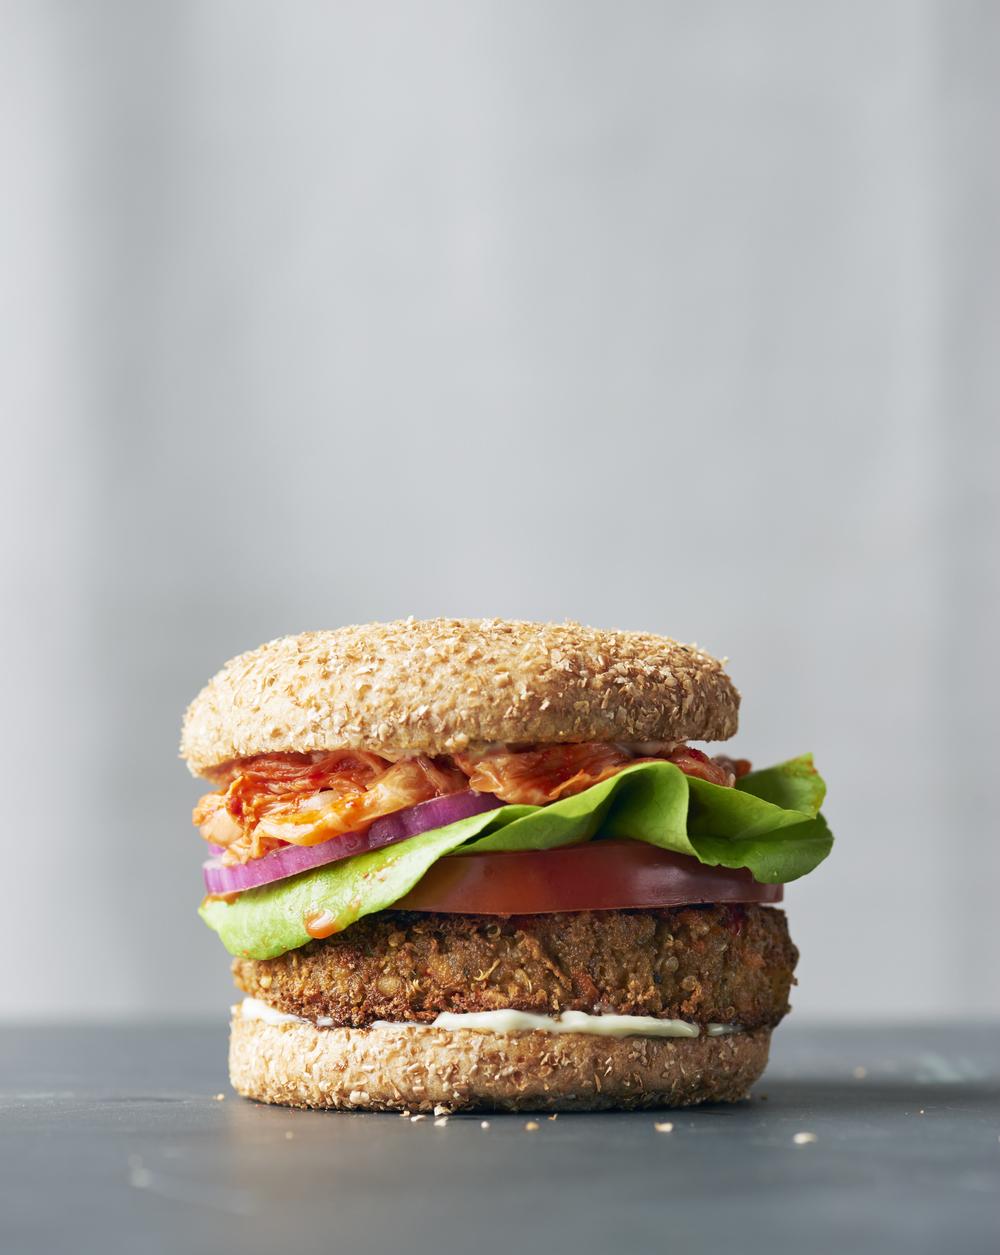 01_Vegan_Burger_WFMM_0017.jpg